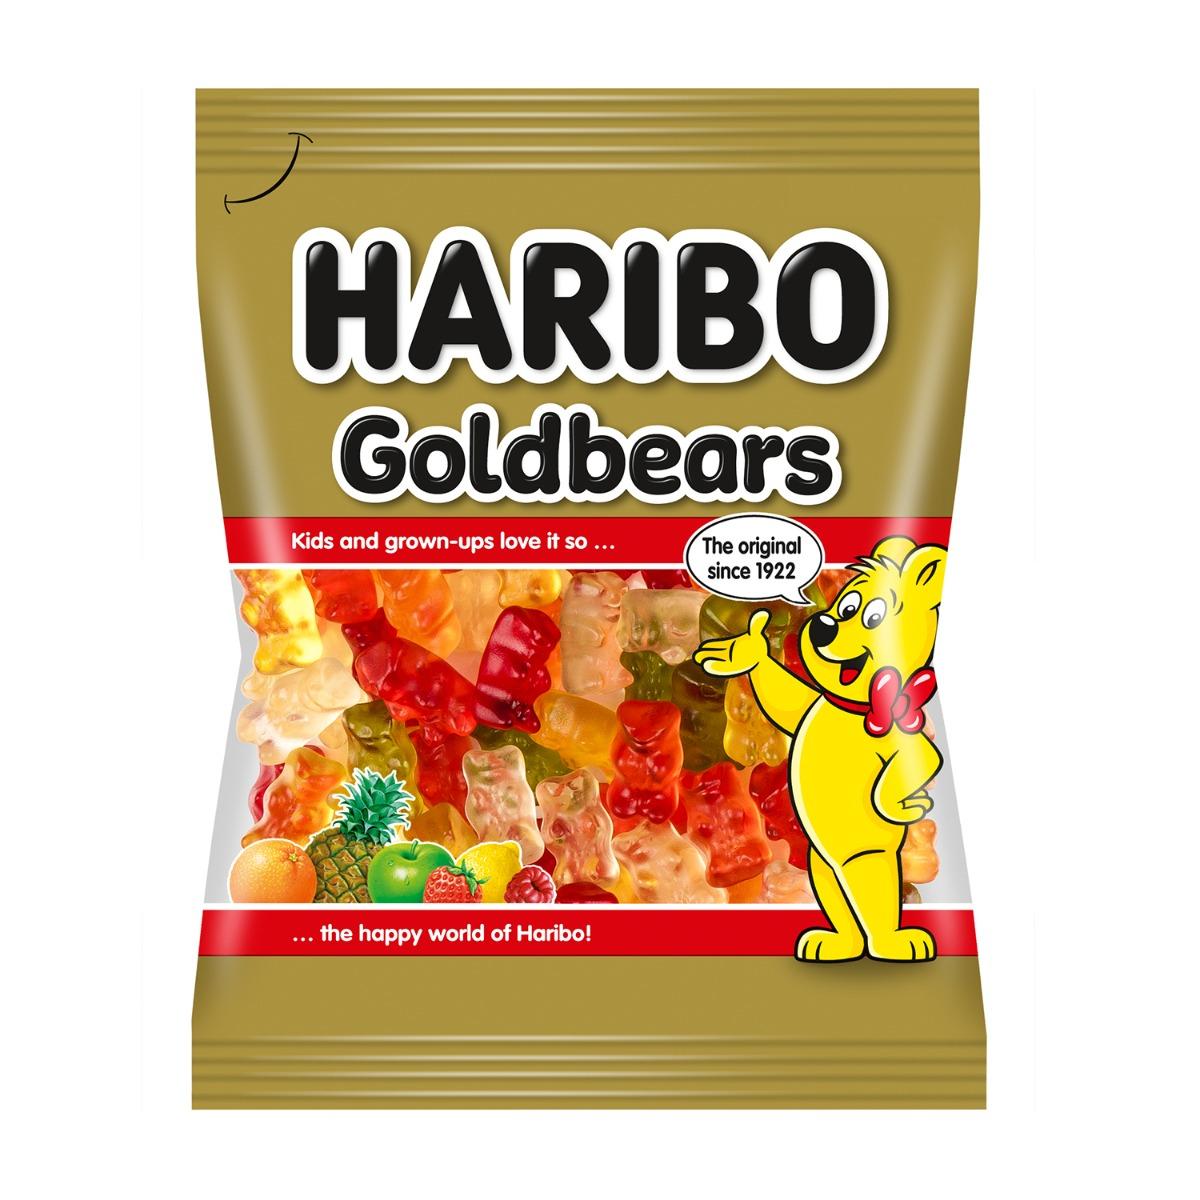 Jeleuri Haribo Goldbears, 200 g imagine